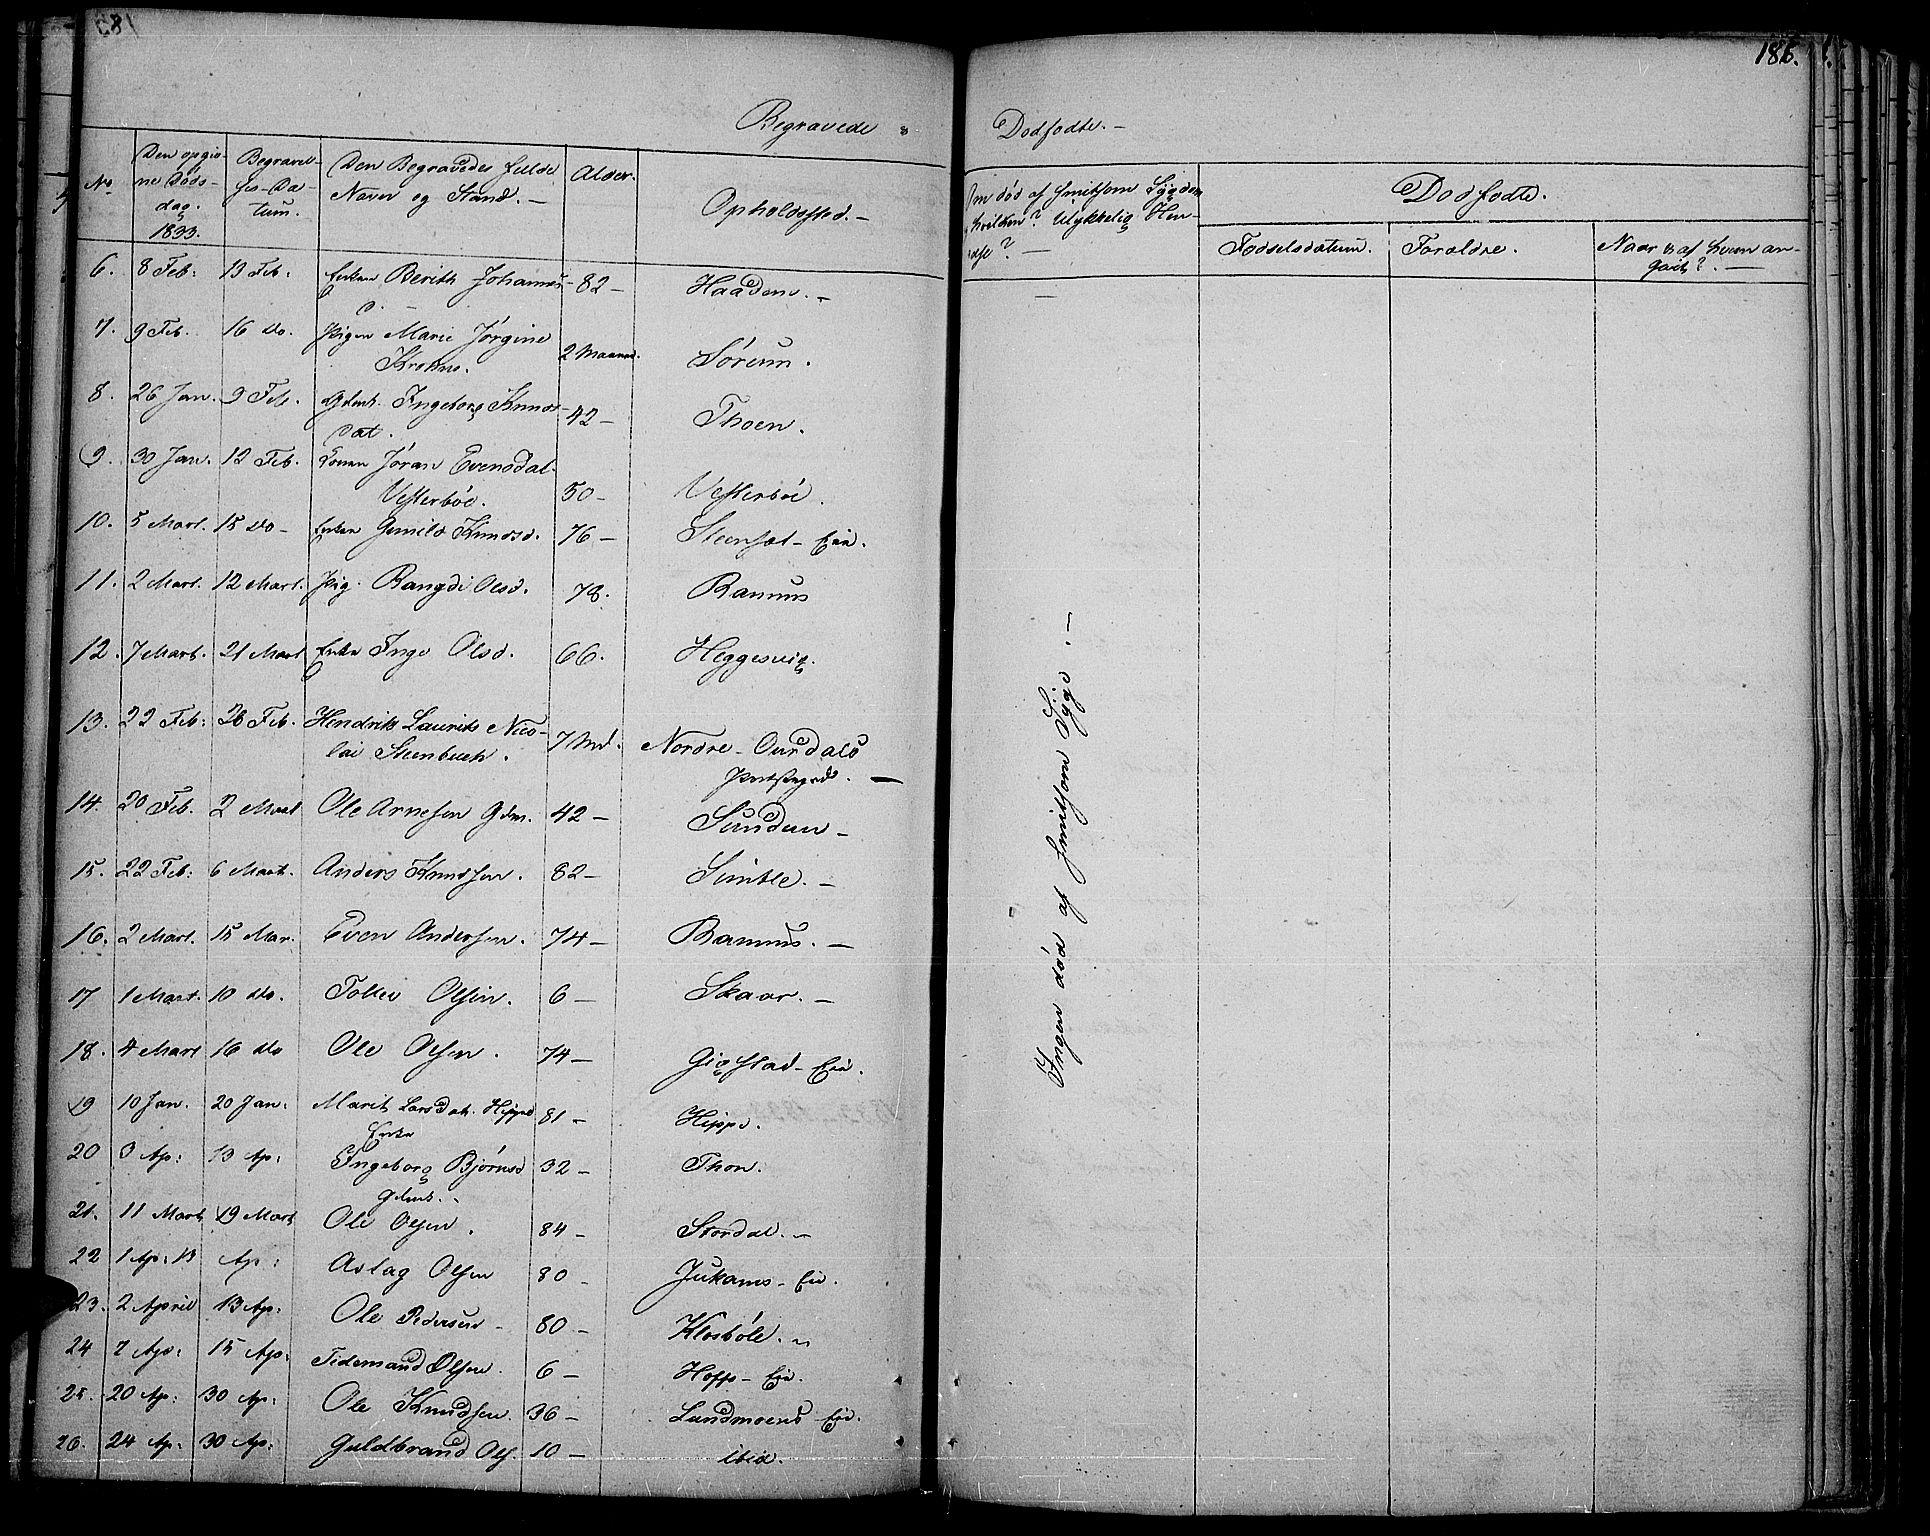 SAH, Nord-Aurdal prestekontor, Ministerialbok nr. 3, 1828-1841, s. 186